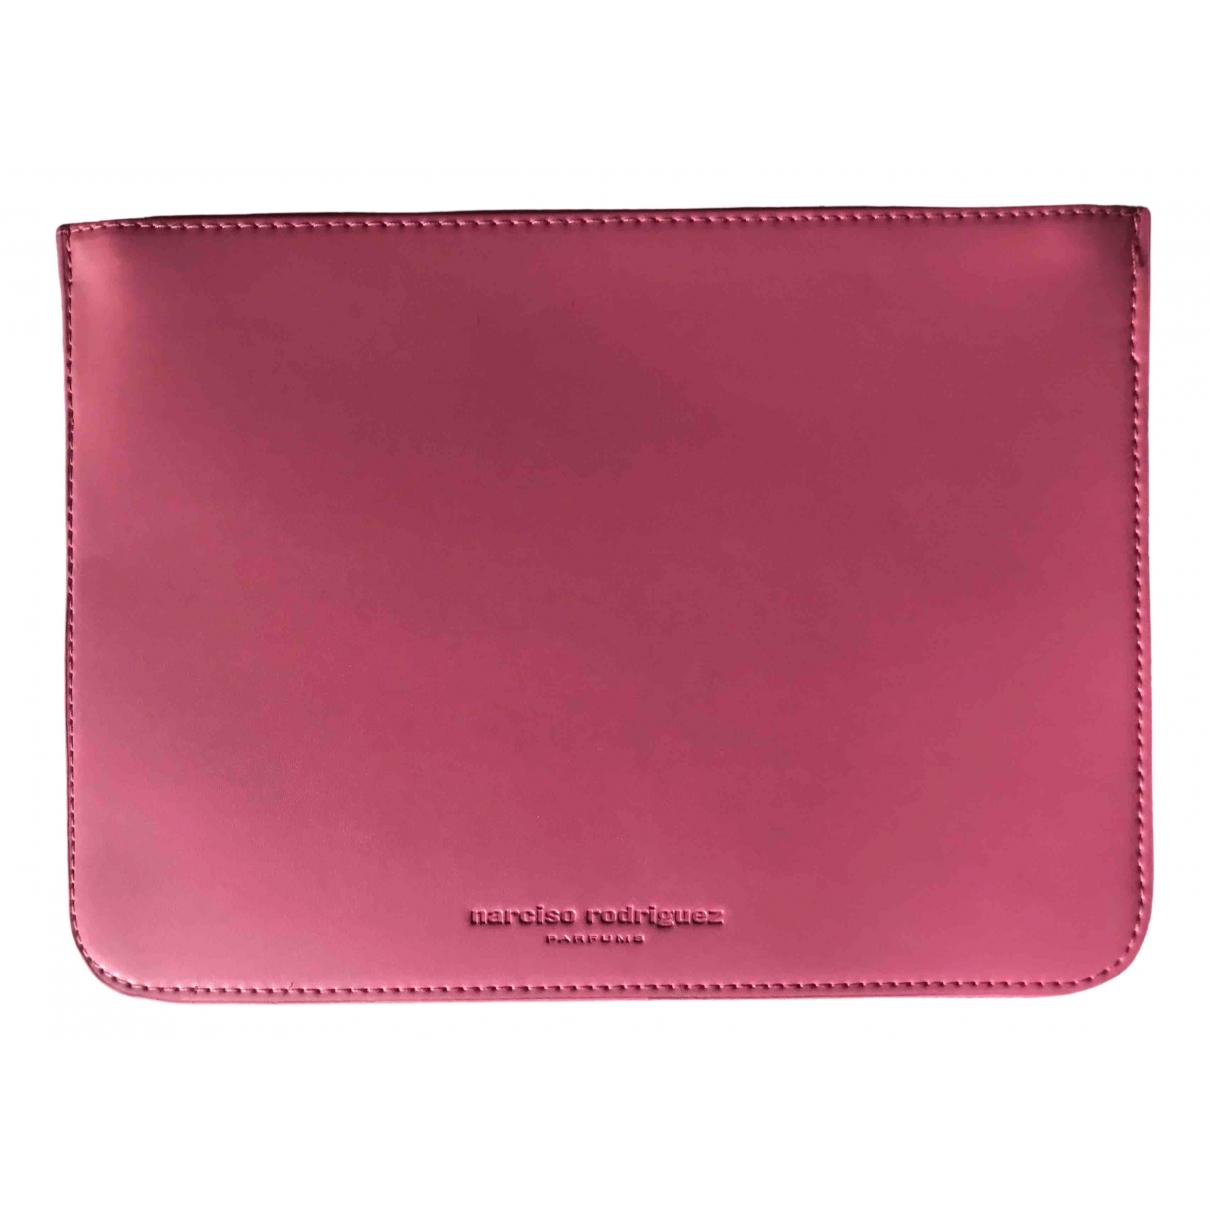 Narciso Rodriguez N Pink Clutch bag for Women N